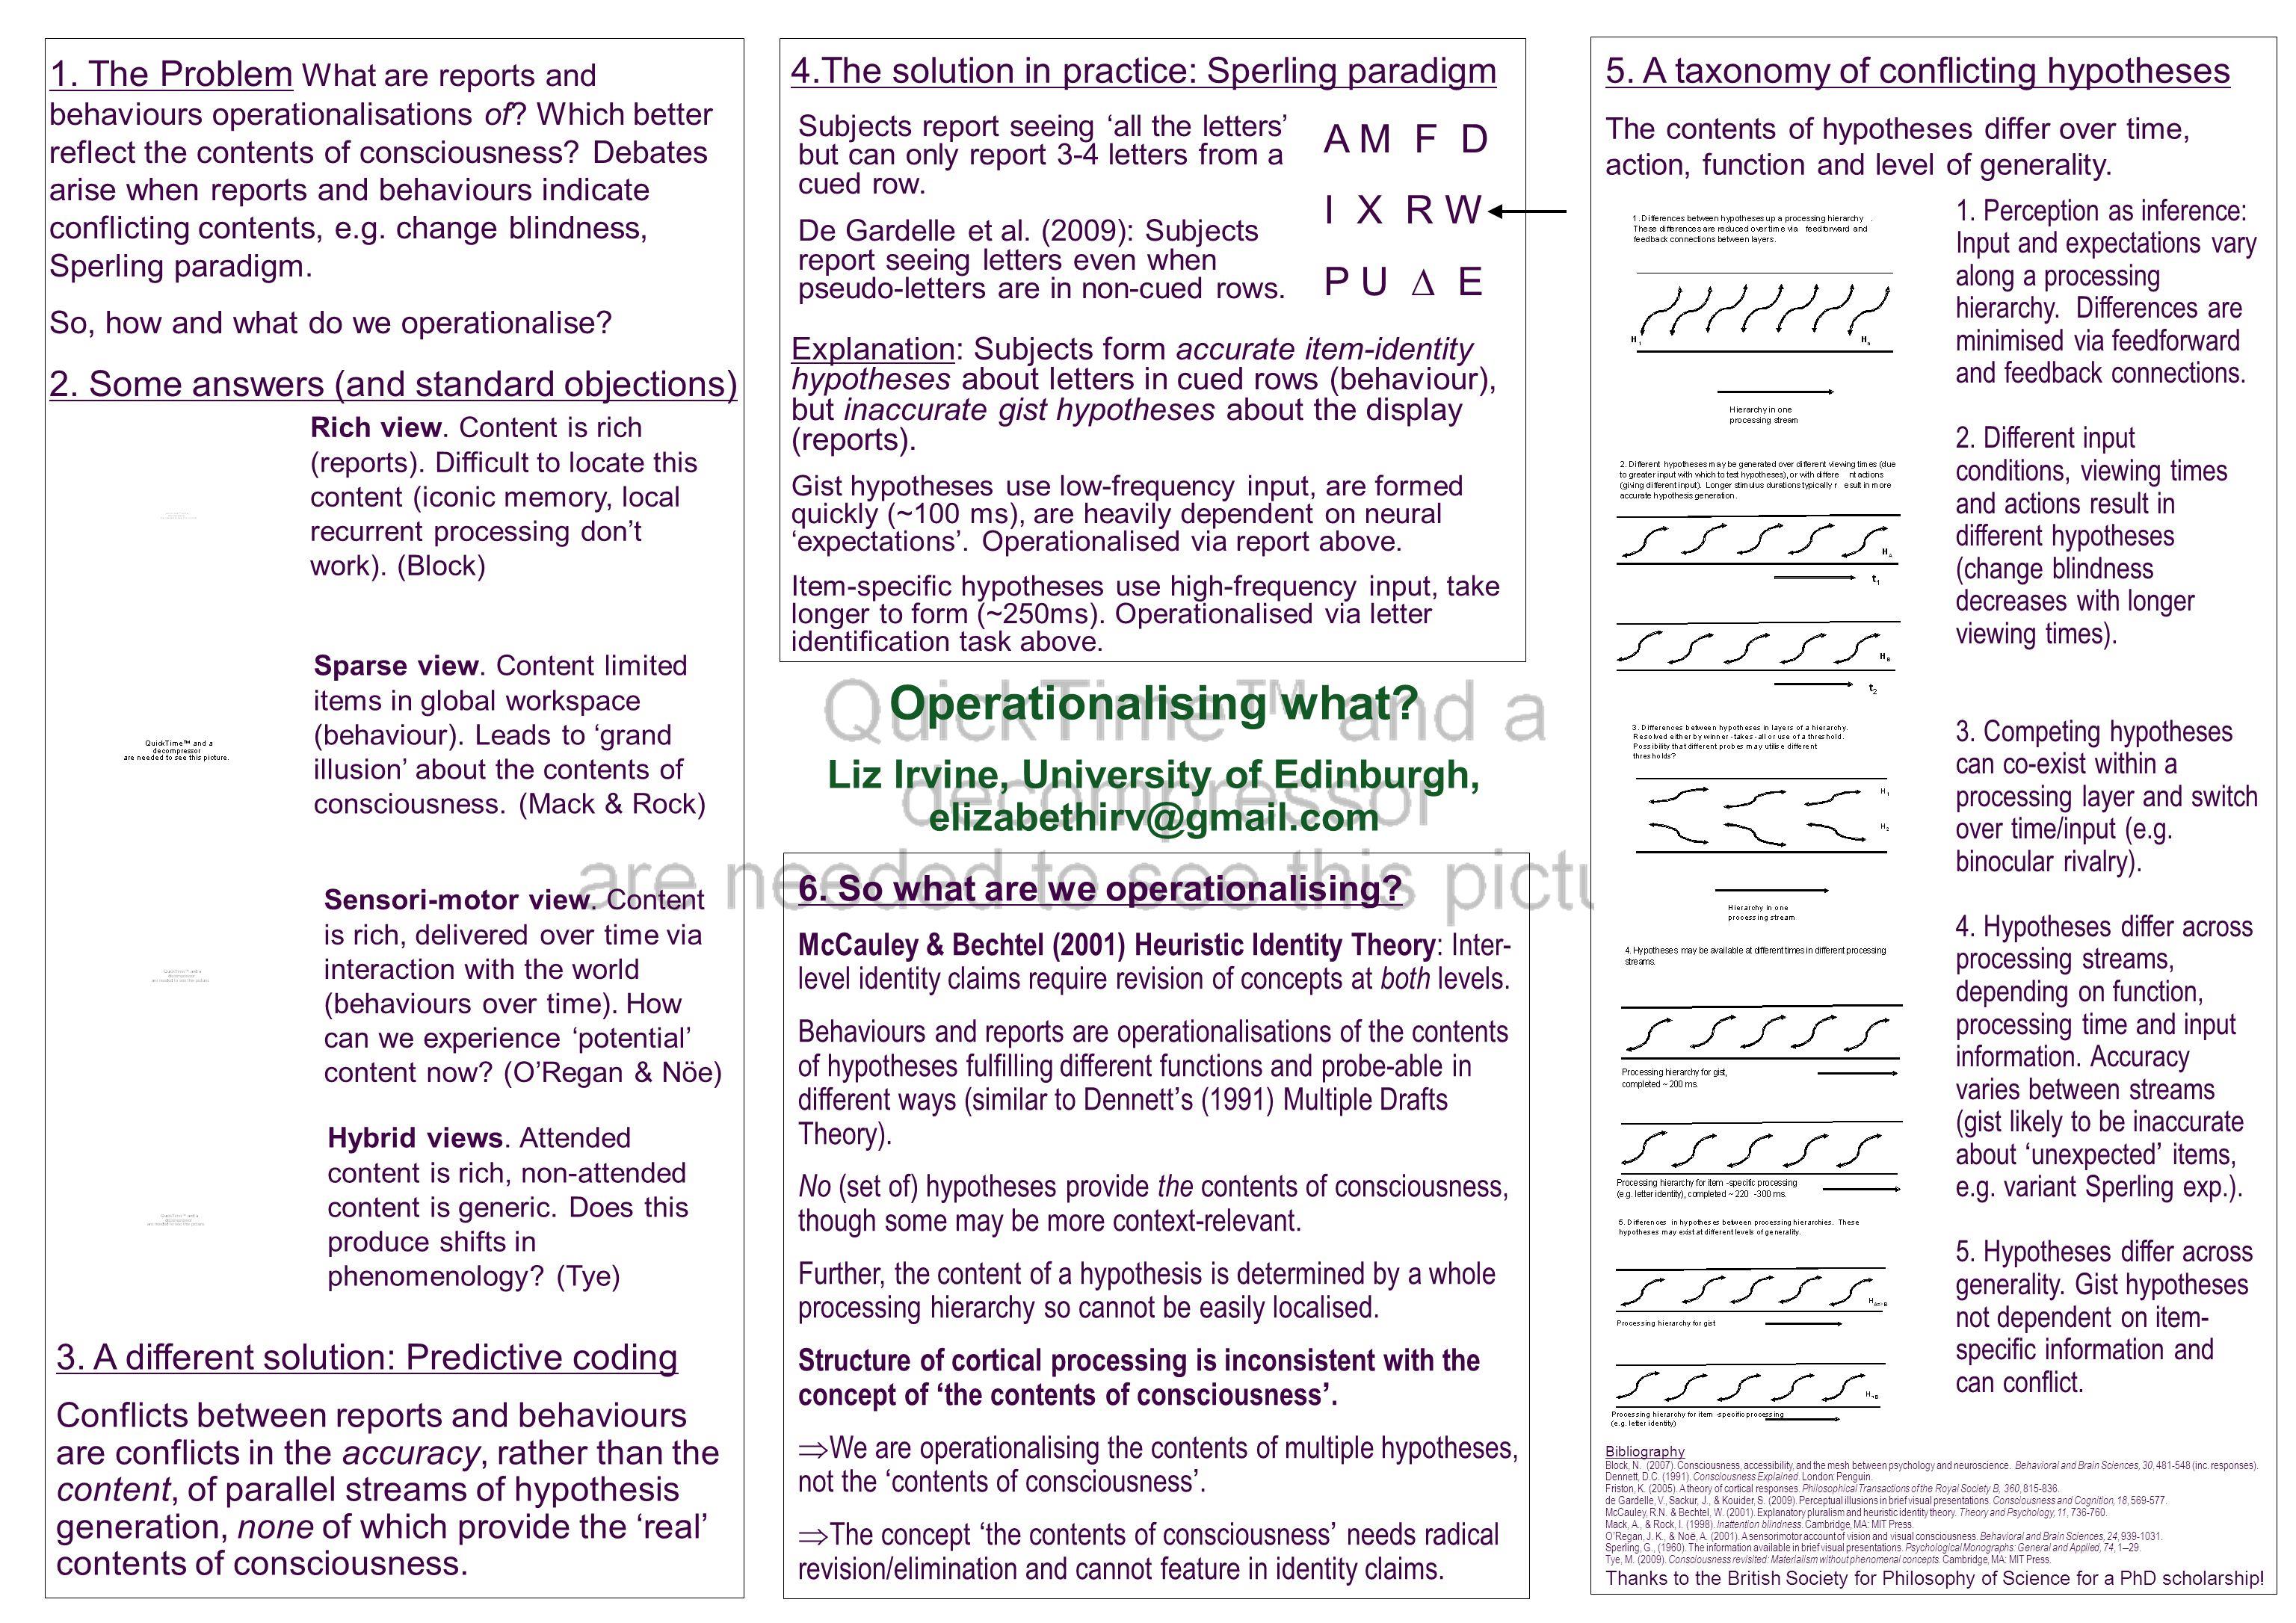 Operationalising what. Liz Irvine, University of Edinburgh, elizabethirv@gmail.com 1.